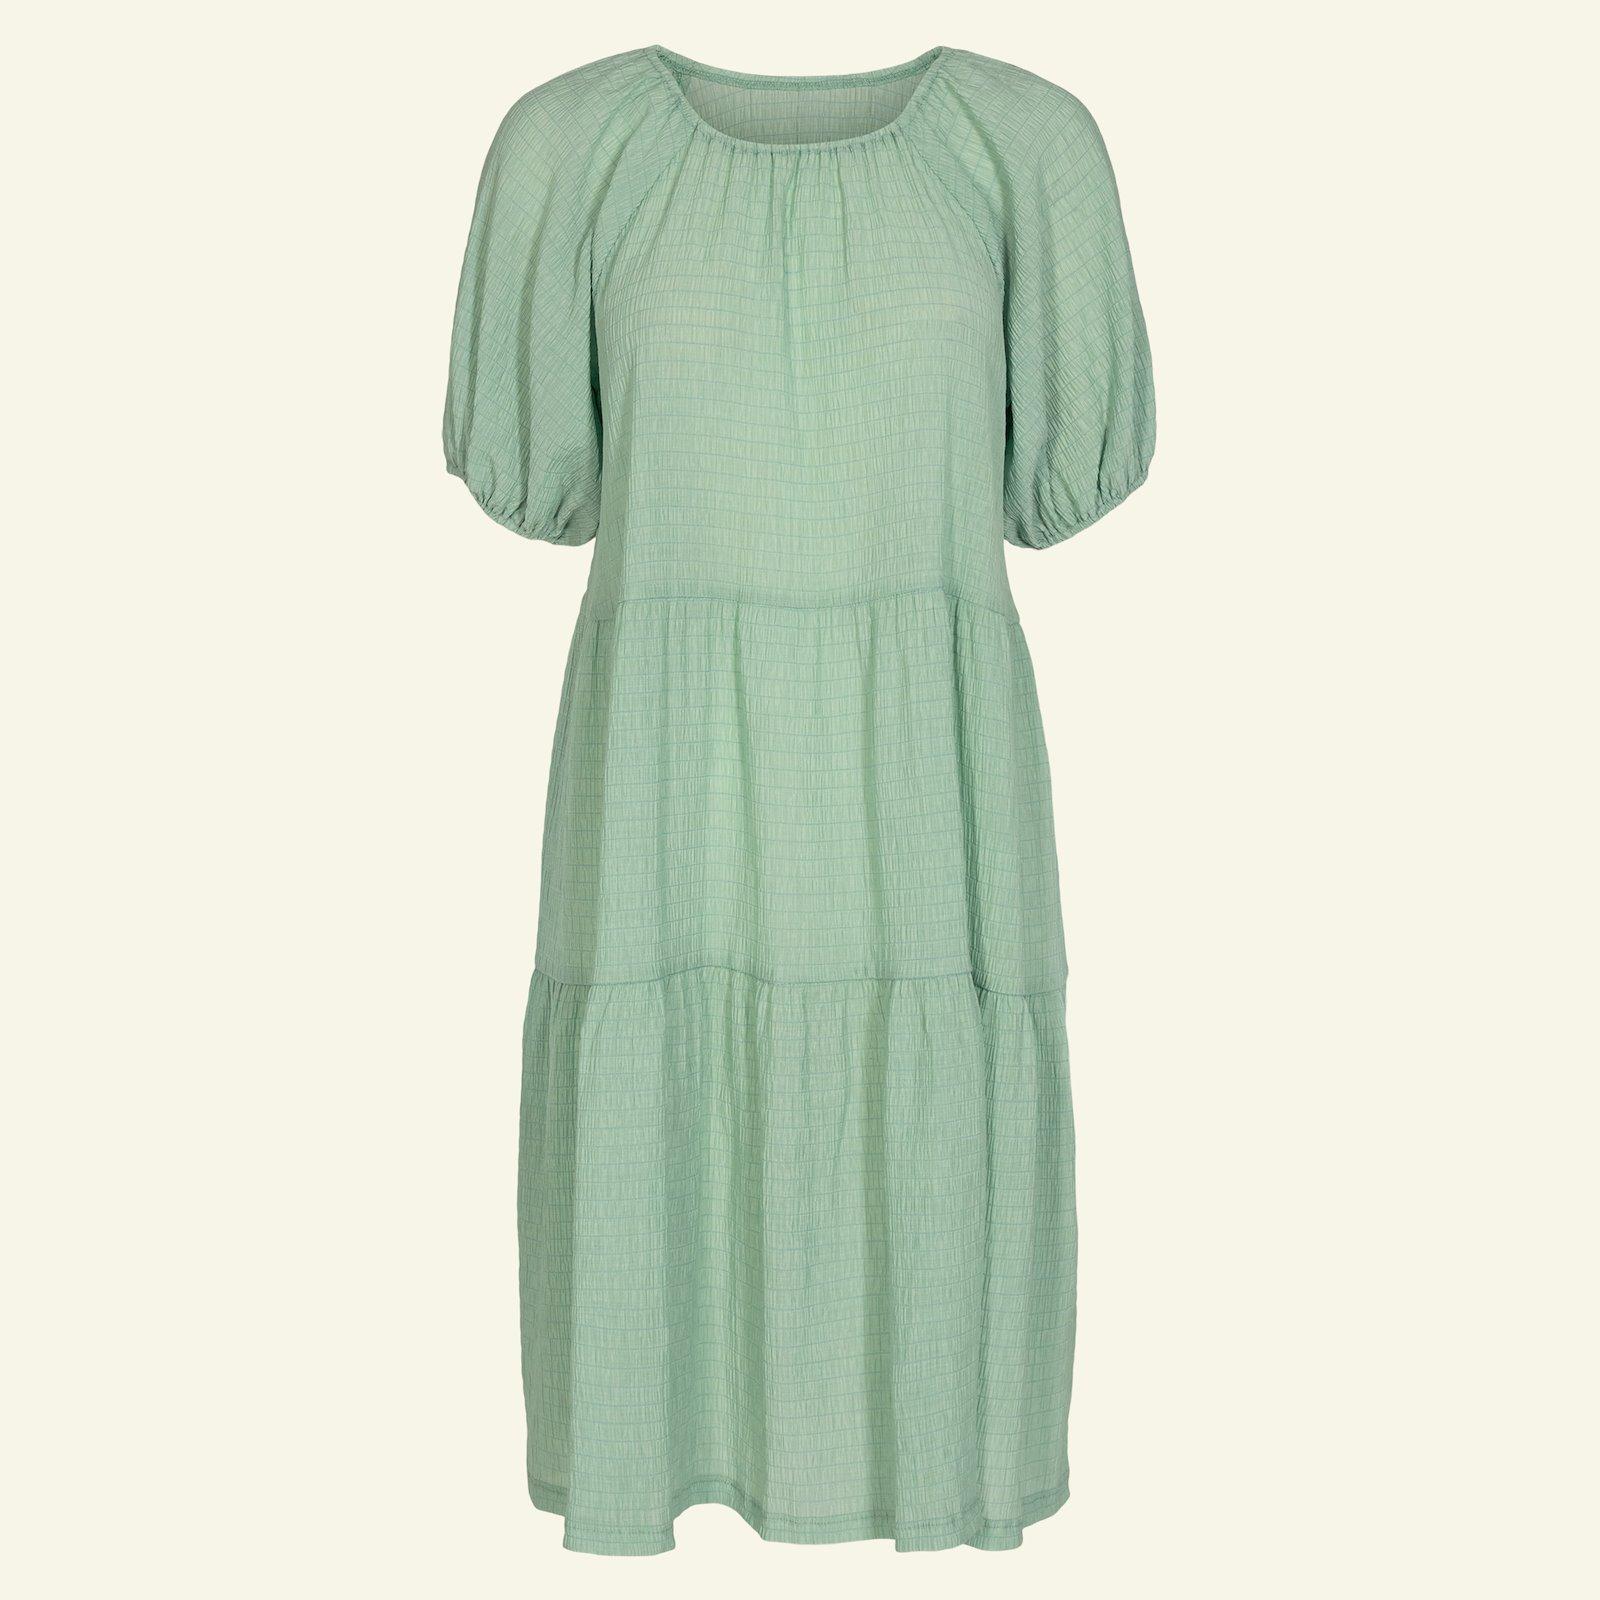 Babydoll dress p23168_560261_sskit